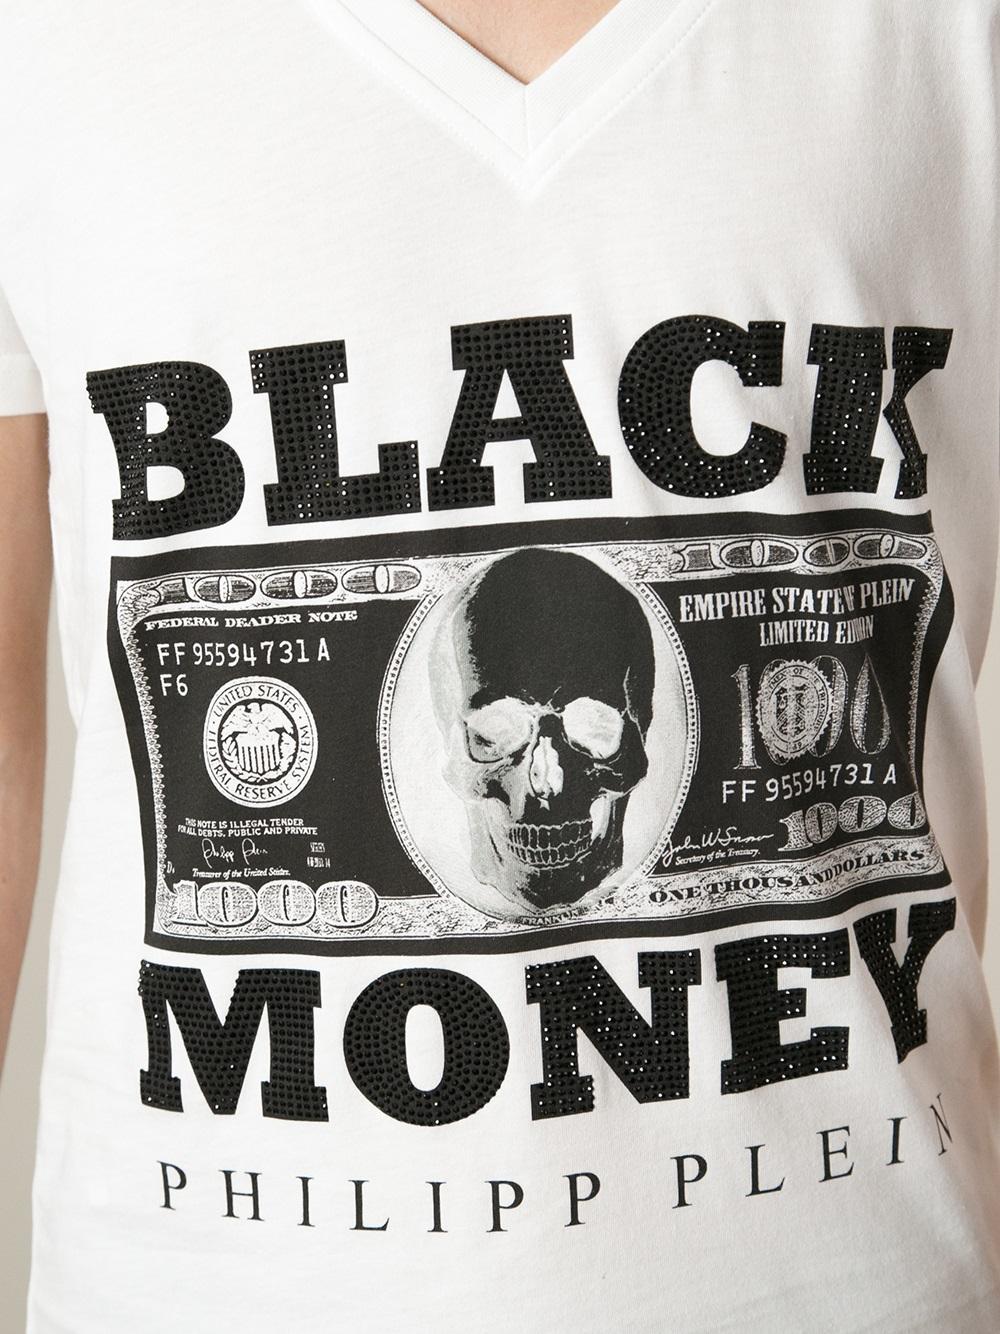 Mens Michael Kors Shirts